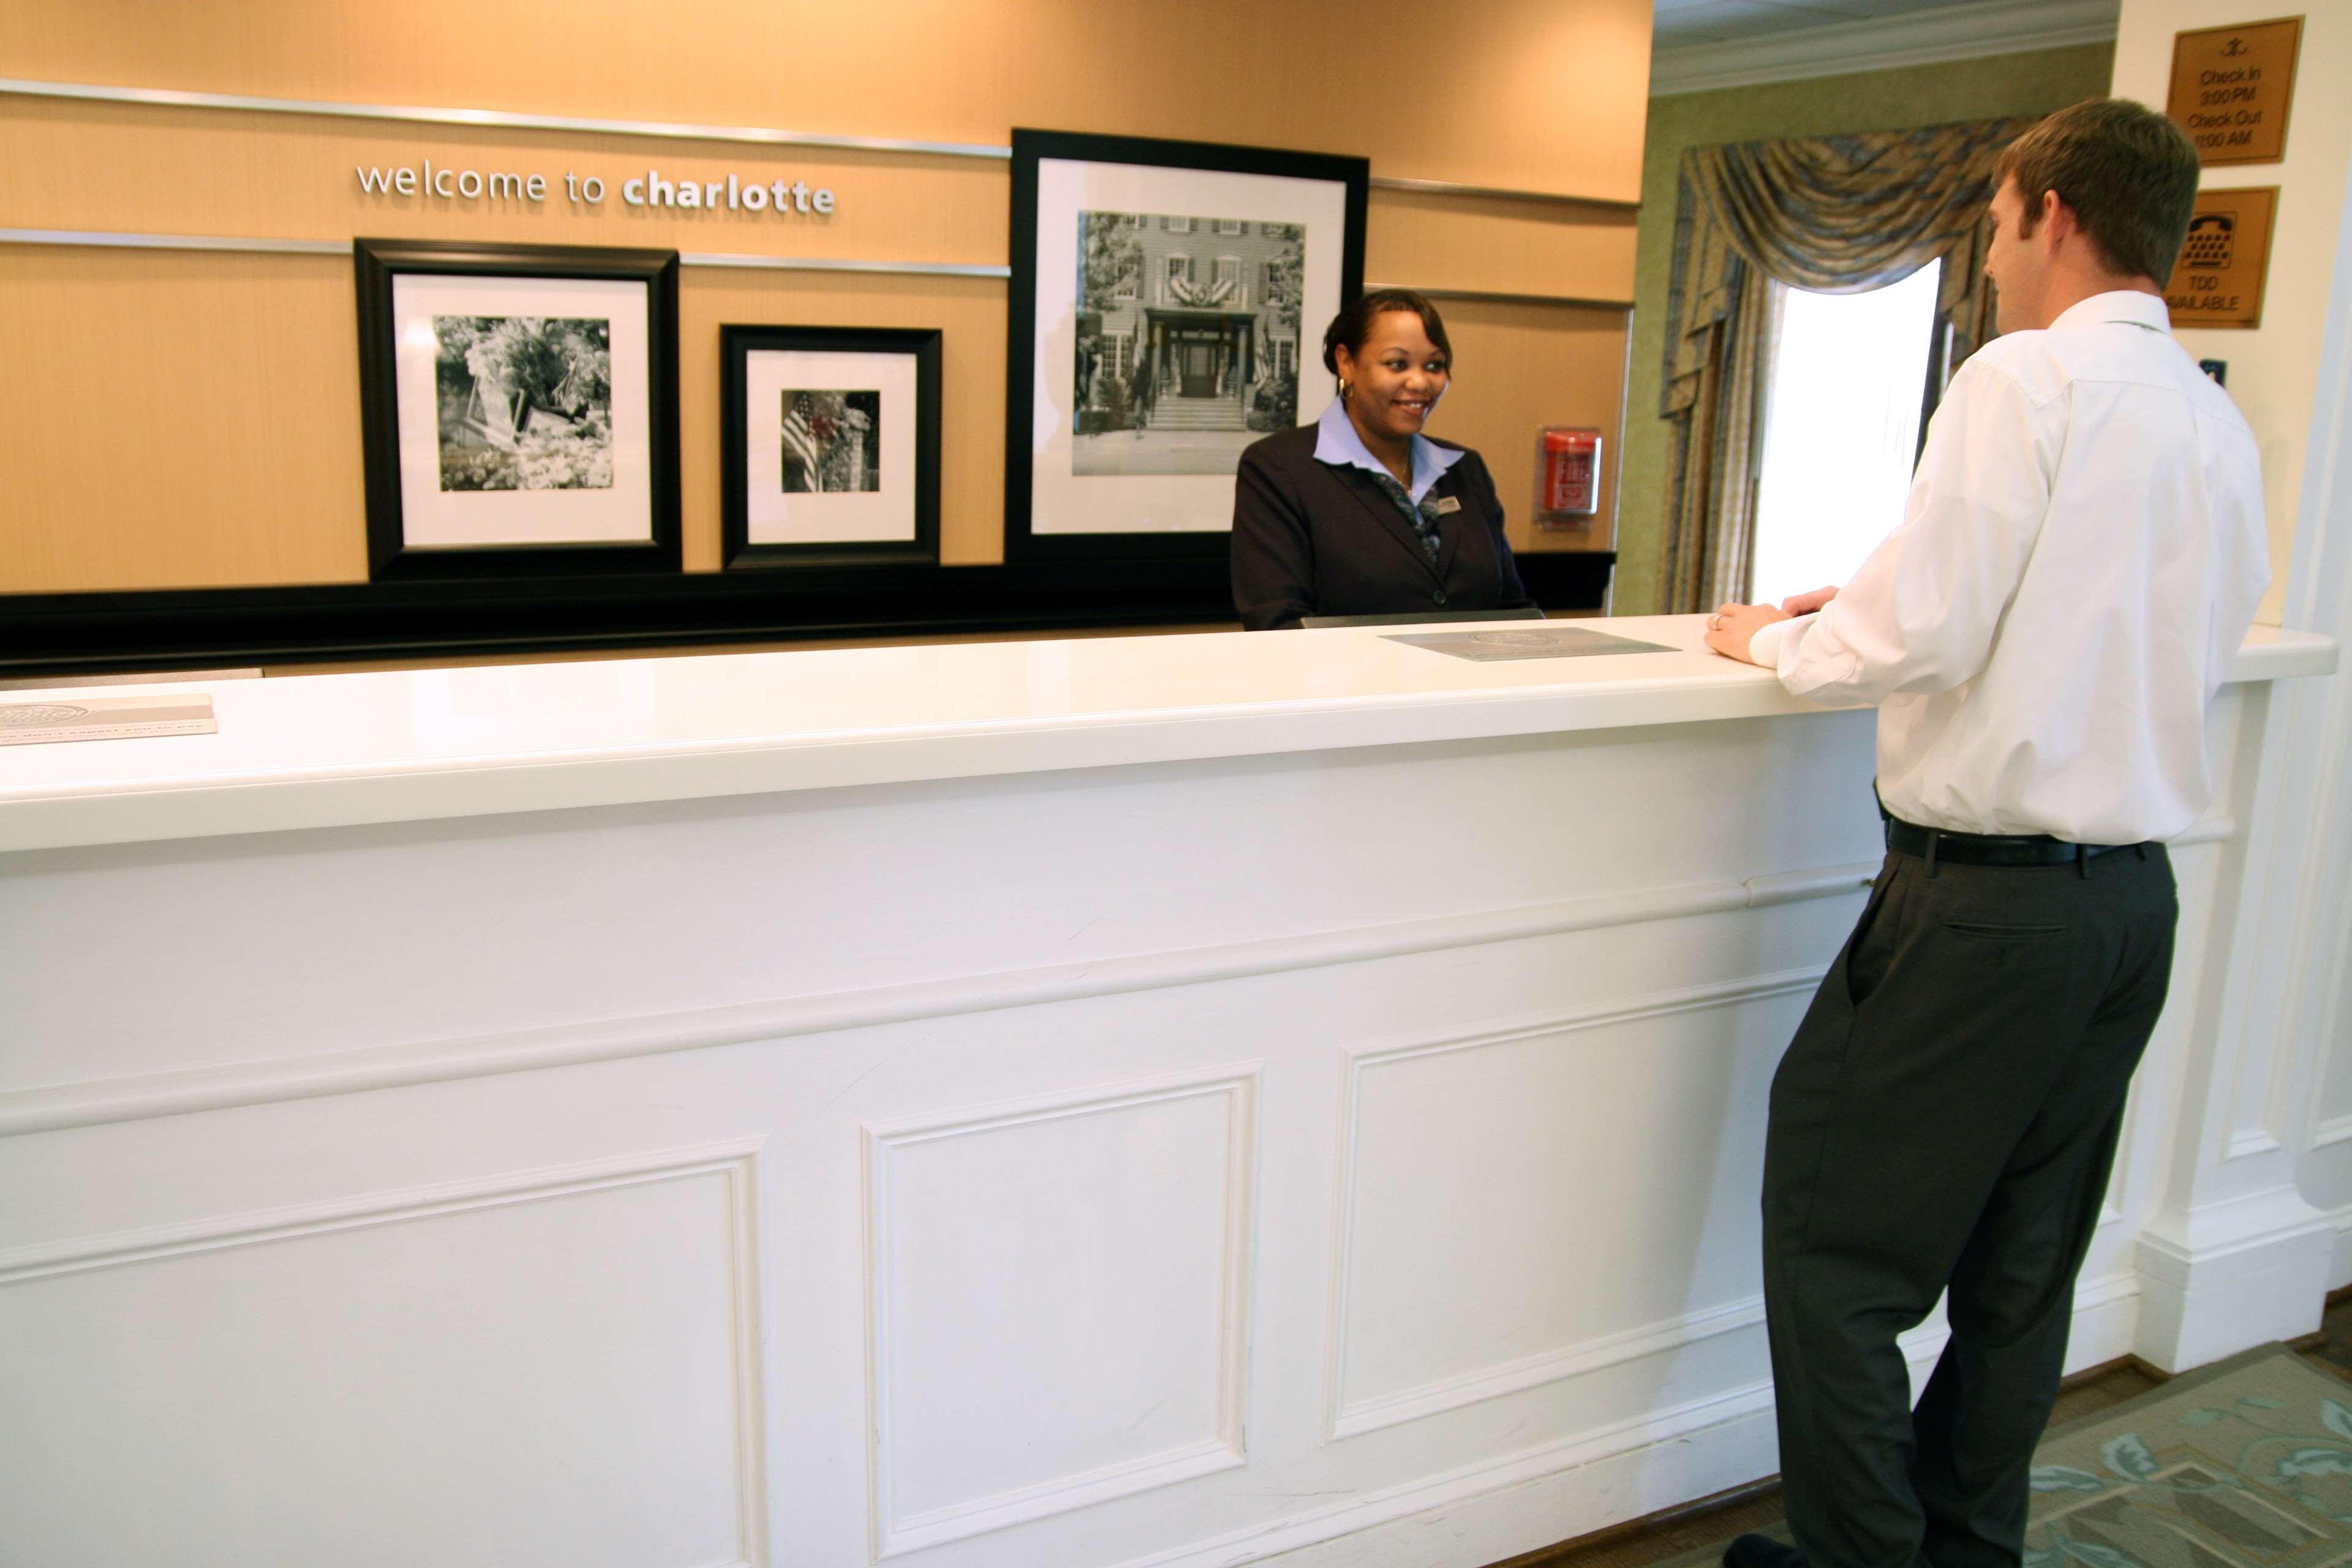 Hampton Inn & Suites Charlotte/South Park at Phillips Place image 4